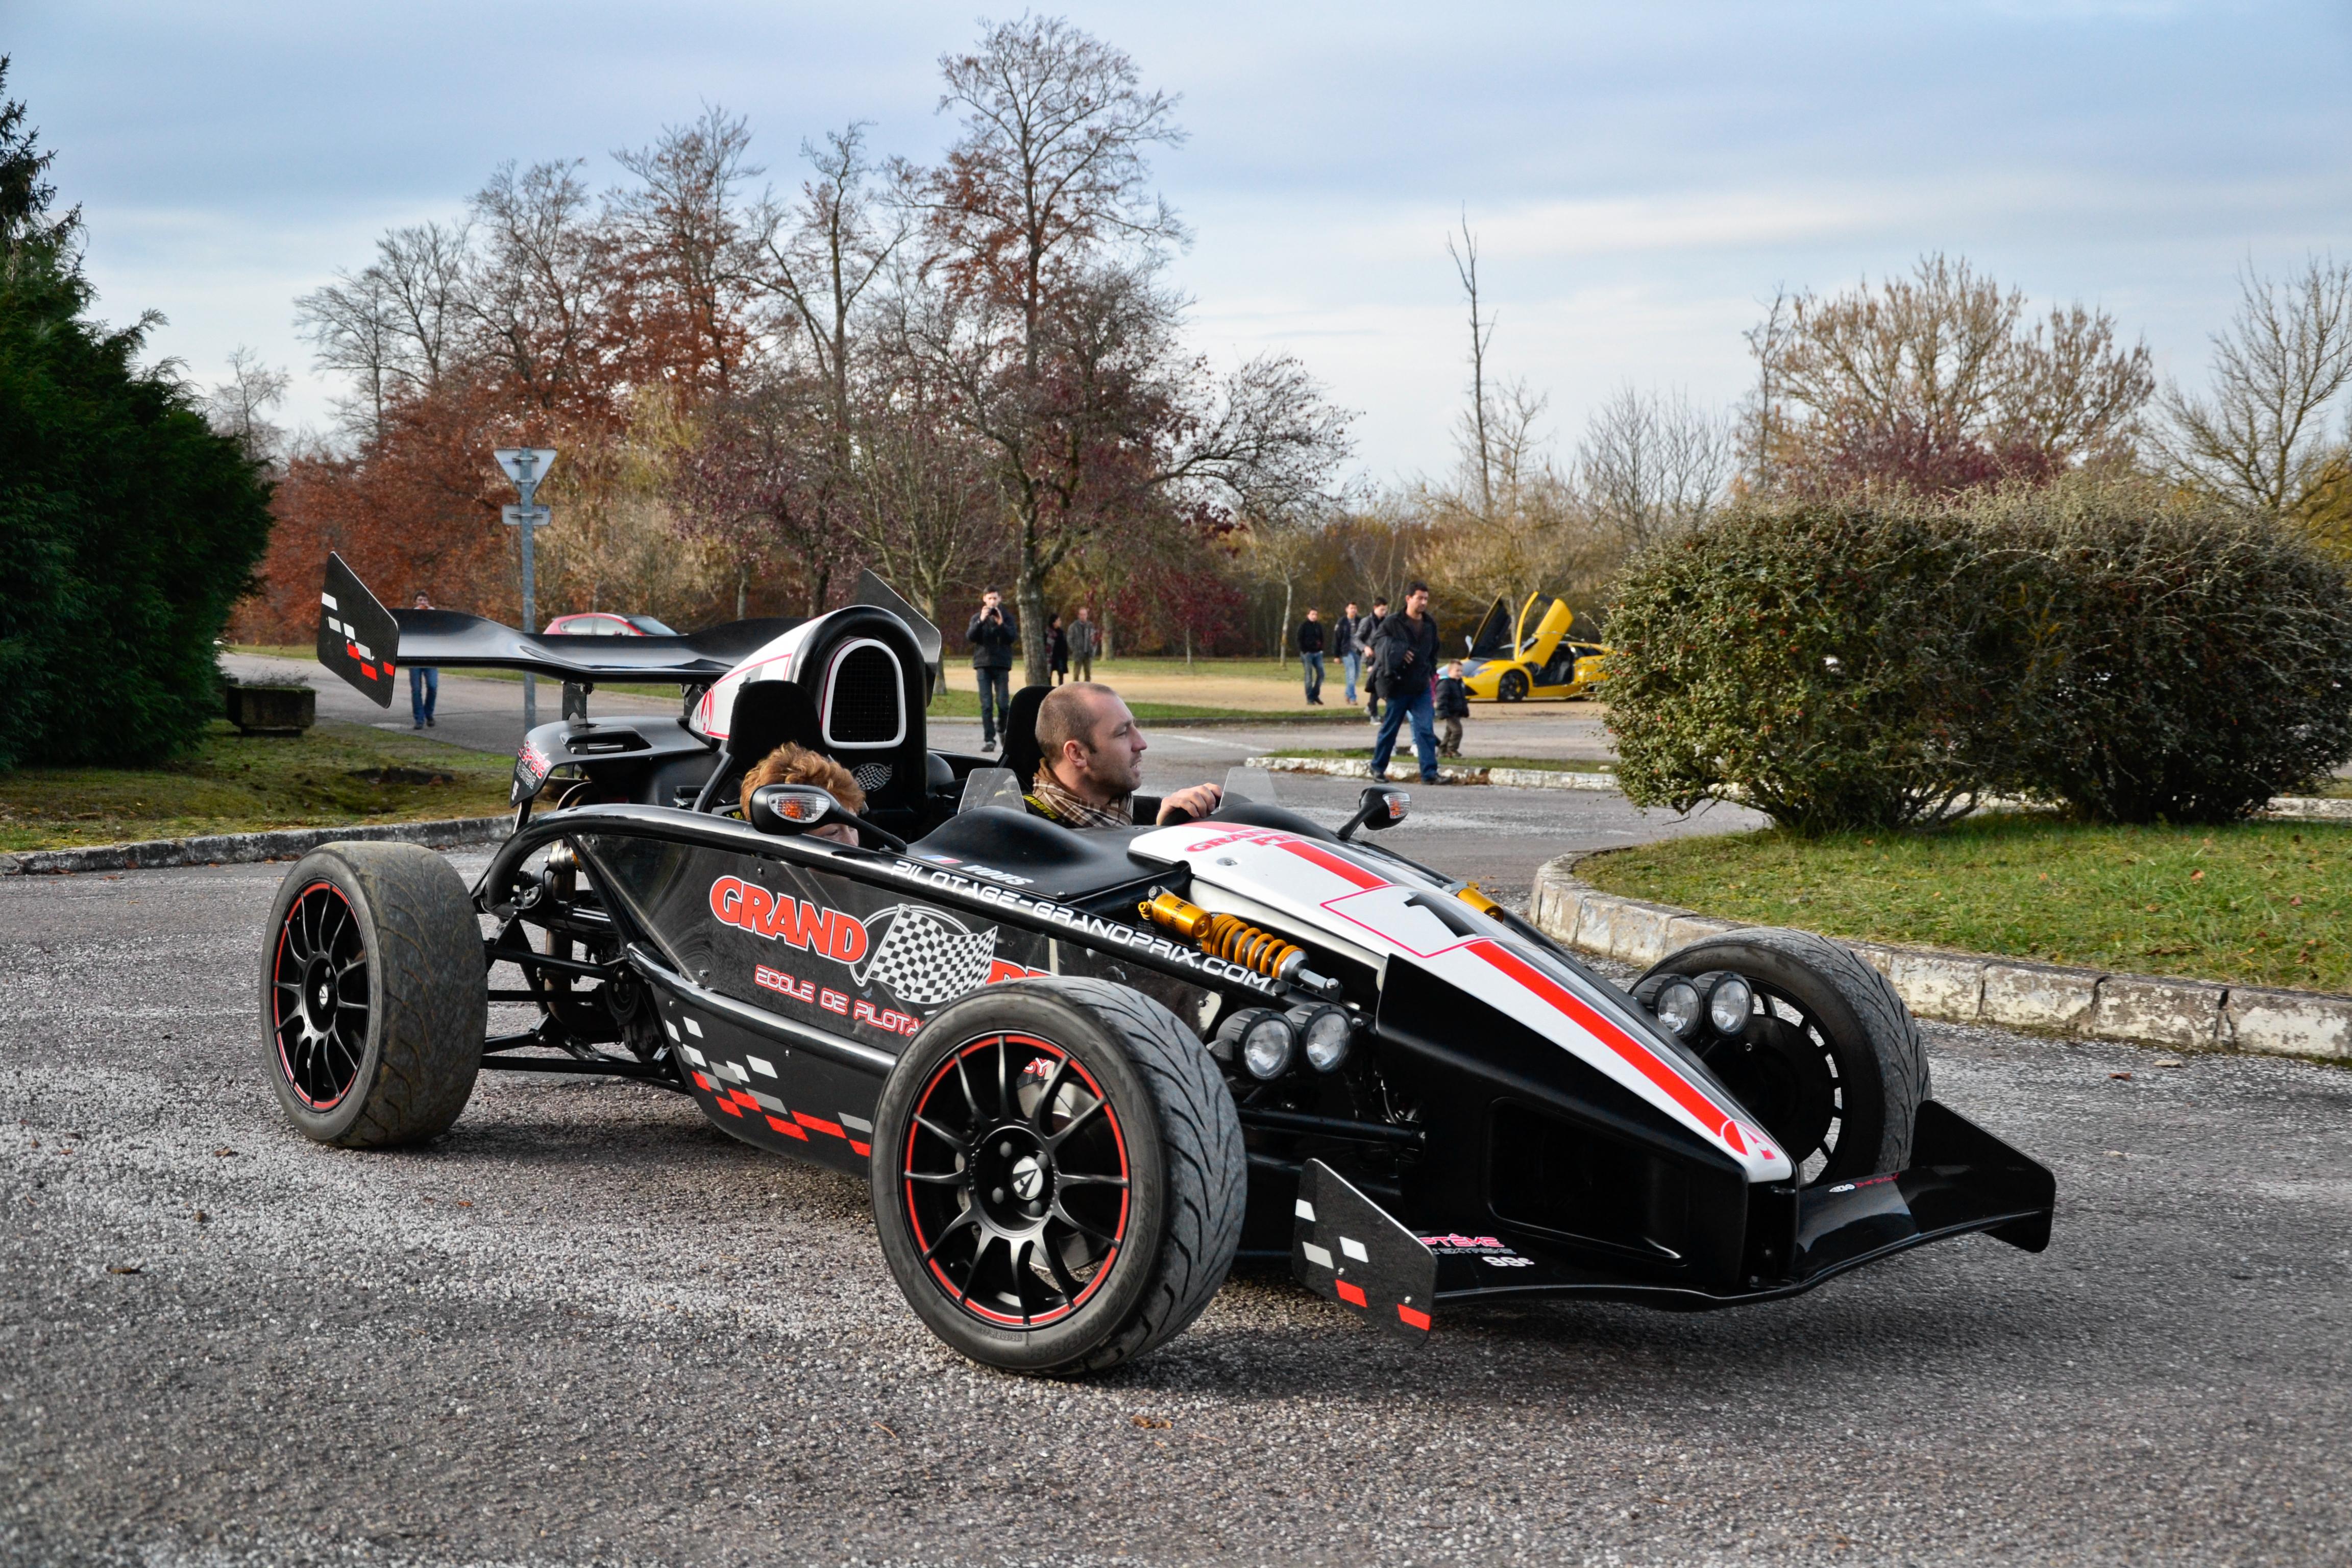 Real Racing Car Games Online